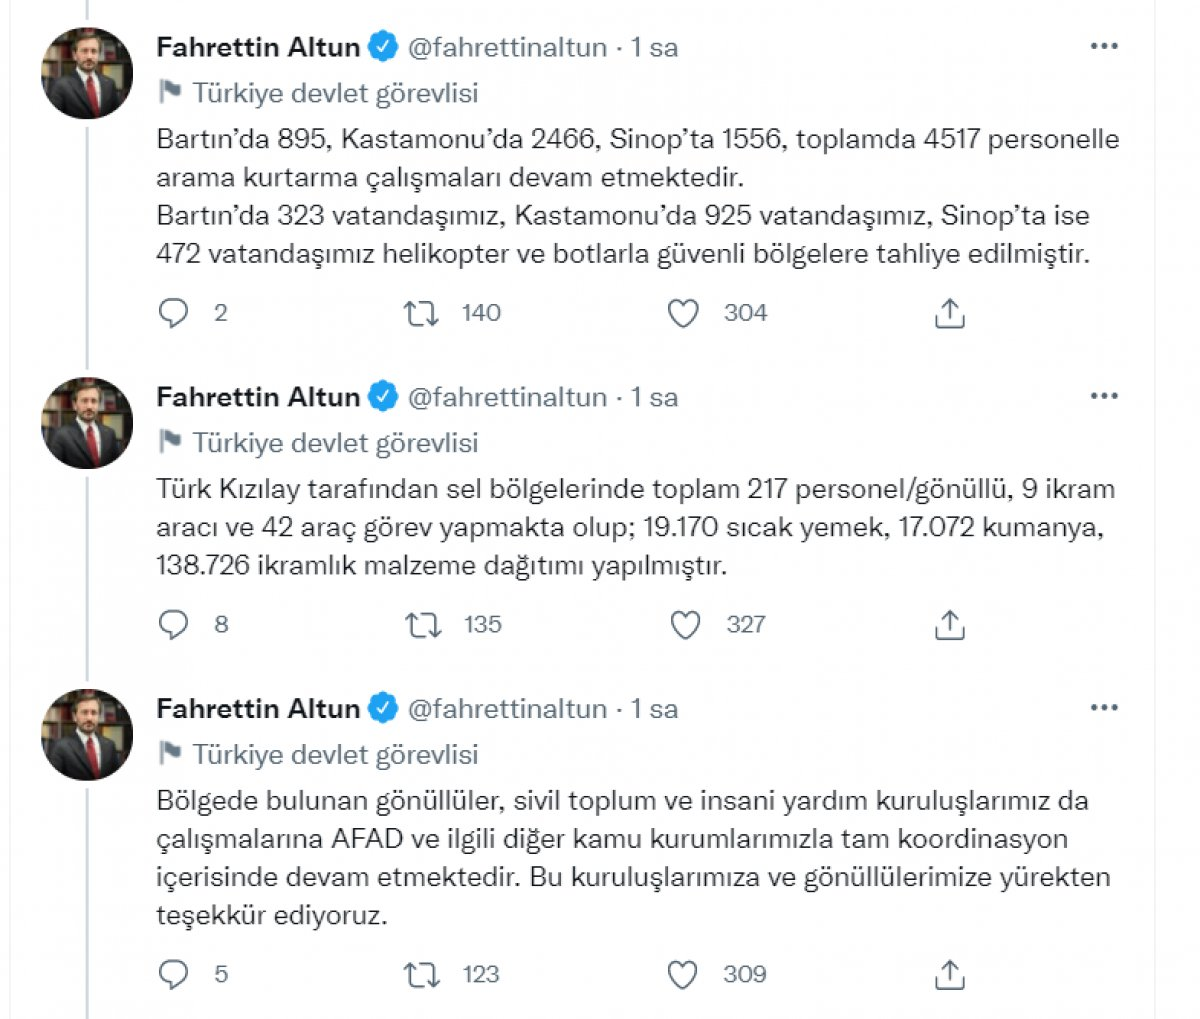 Fahrettin Altun: Dezenformasyonlara itibar etmeyiniz #3